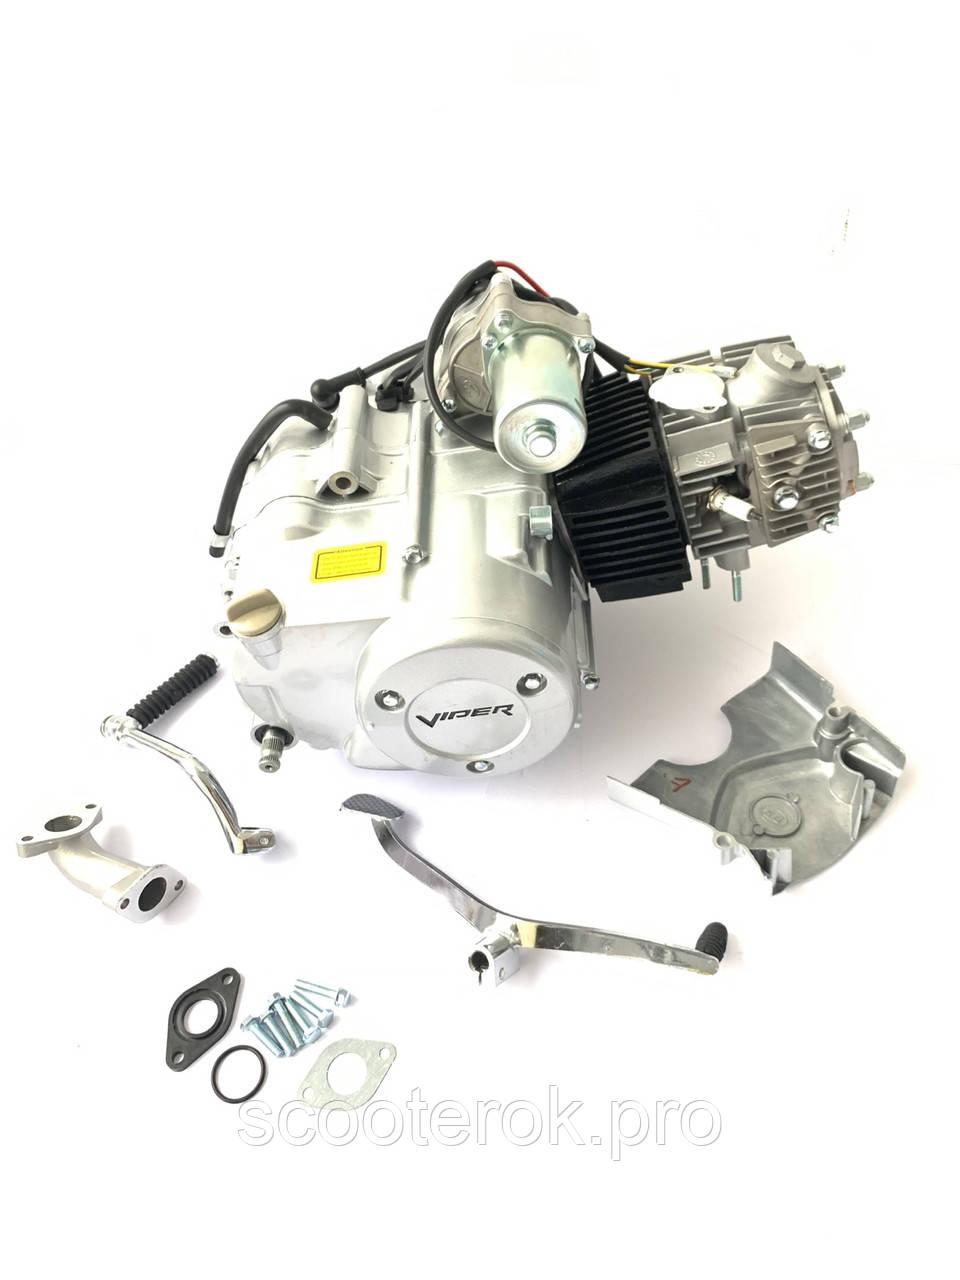 Двигатель Вайпер , Active JH-110 полуавтомат ,Китай.